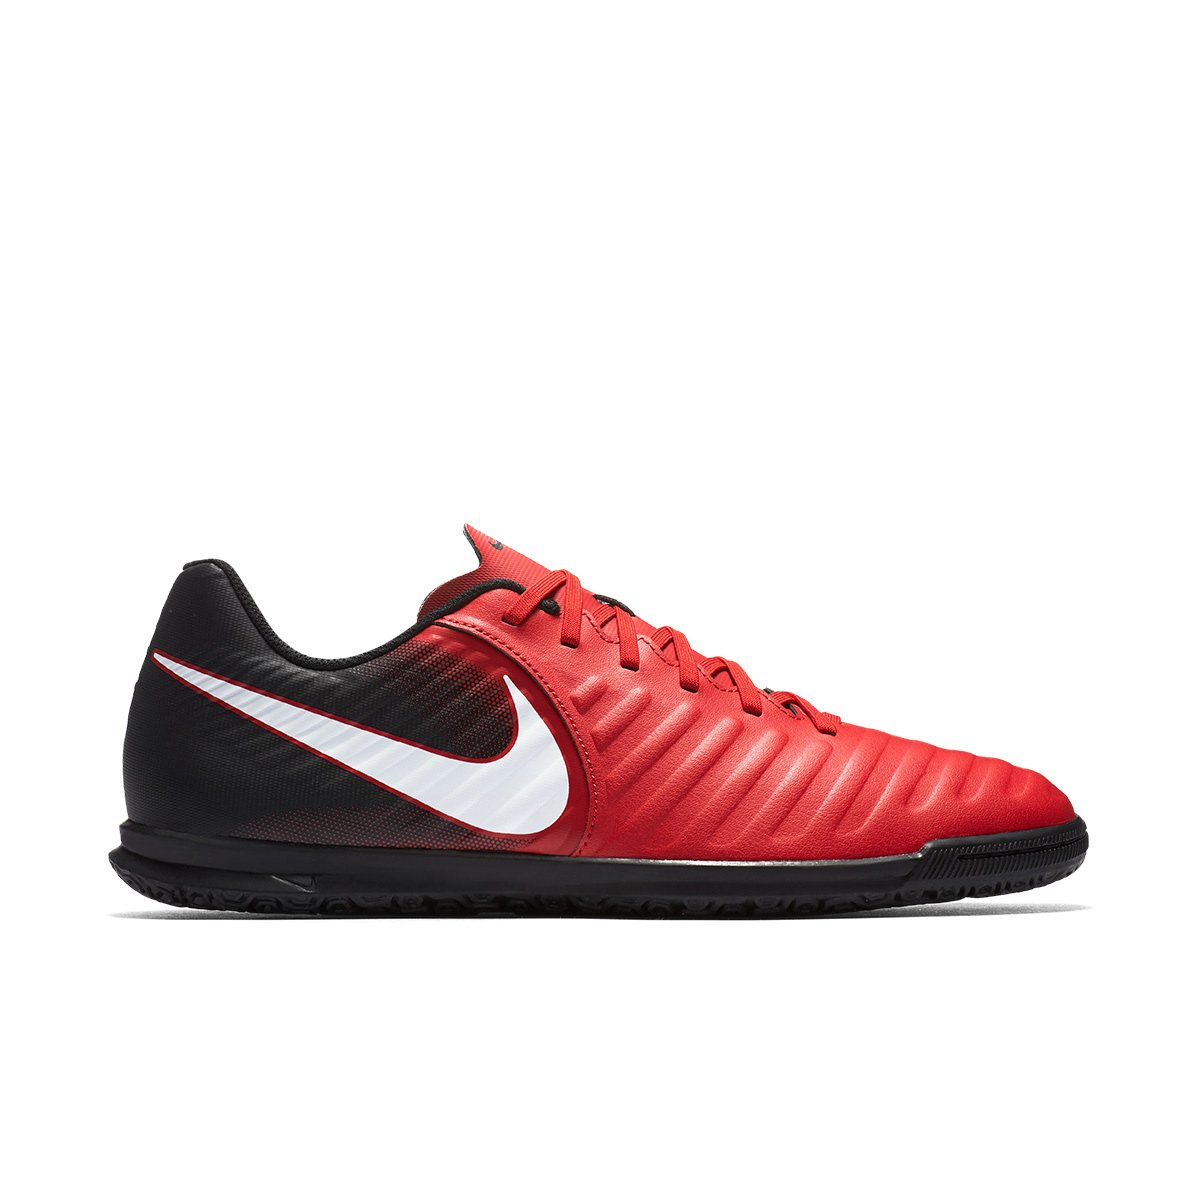 b38cdfeb23 Chuteira Futsal Nike Tiempo Rio 4 IC - Compre Agora